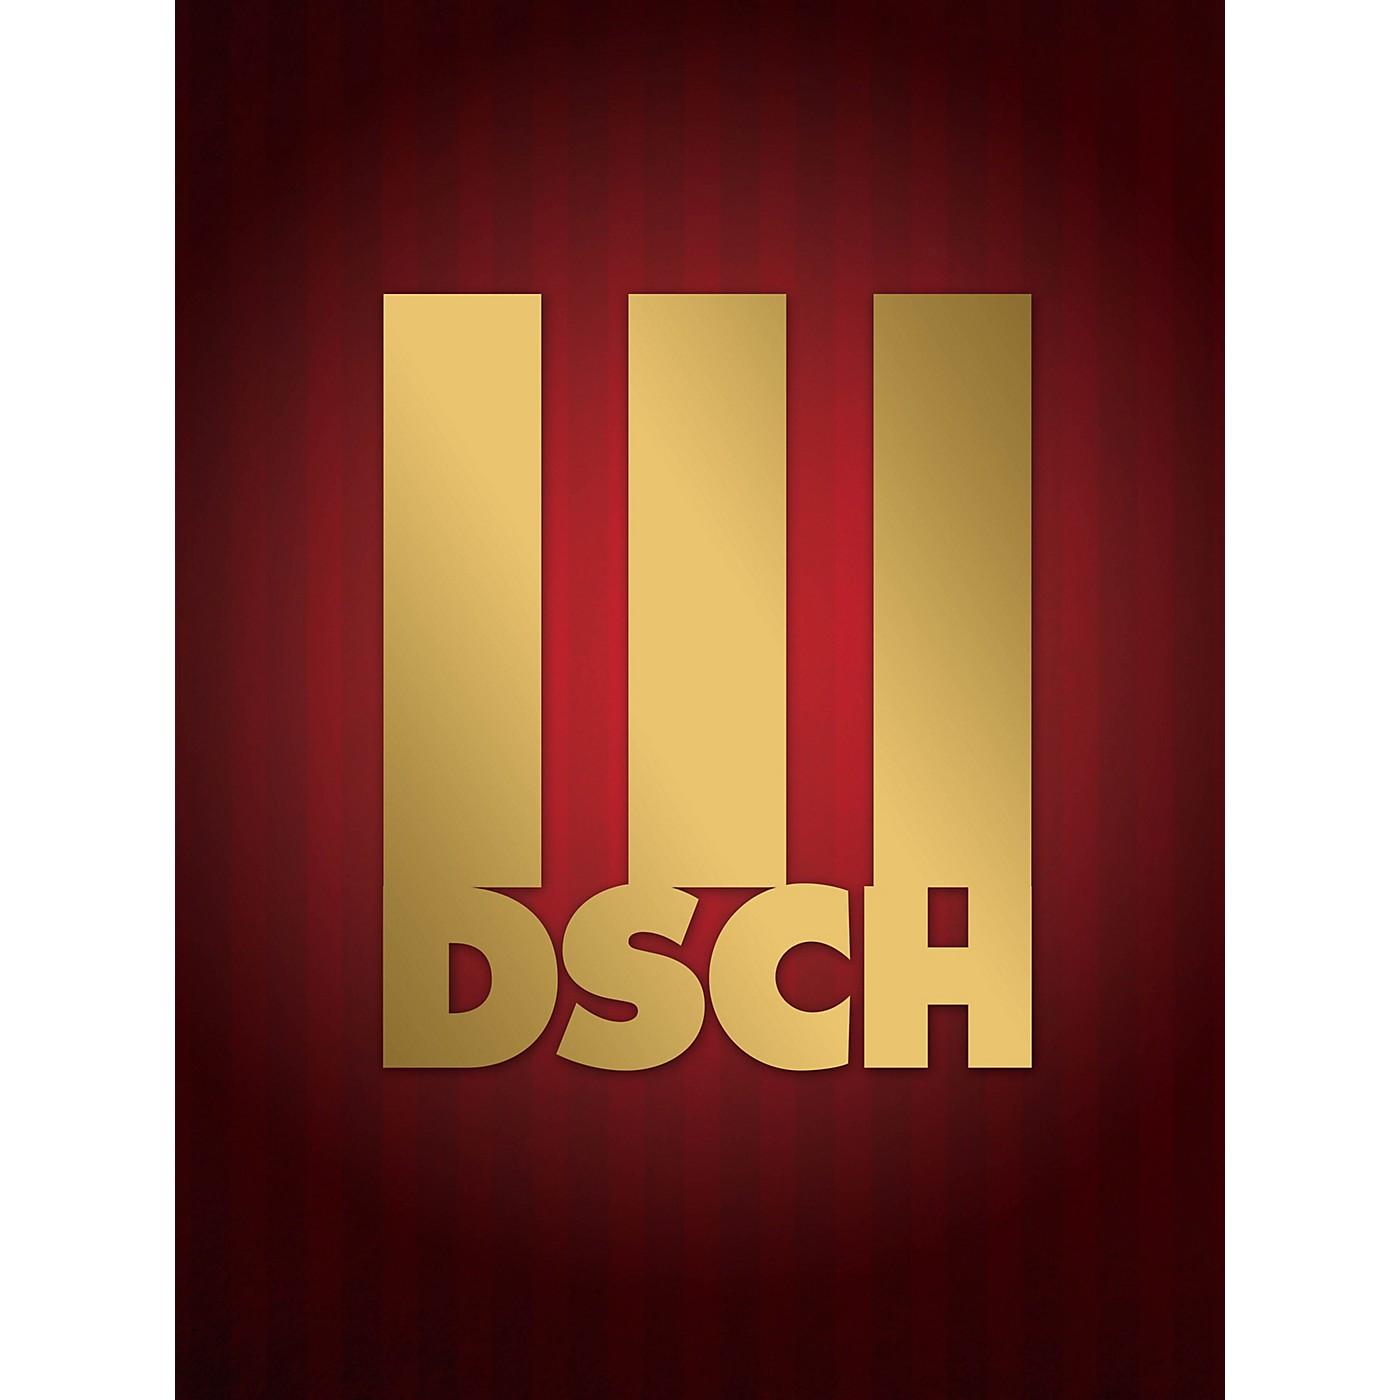 DSCH Katerina Izmailova Op. 29/114 - Piano Score DSCH Series Hardcover by Dmitri Shostakovich thumbnail